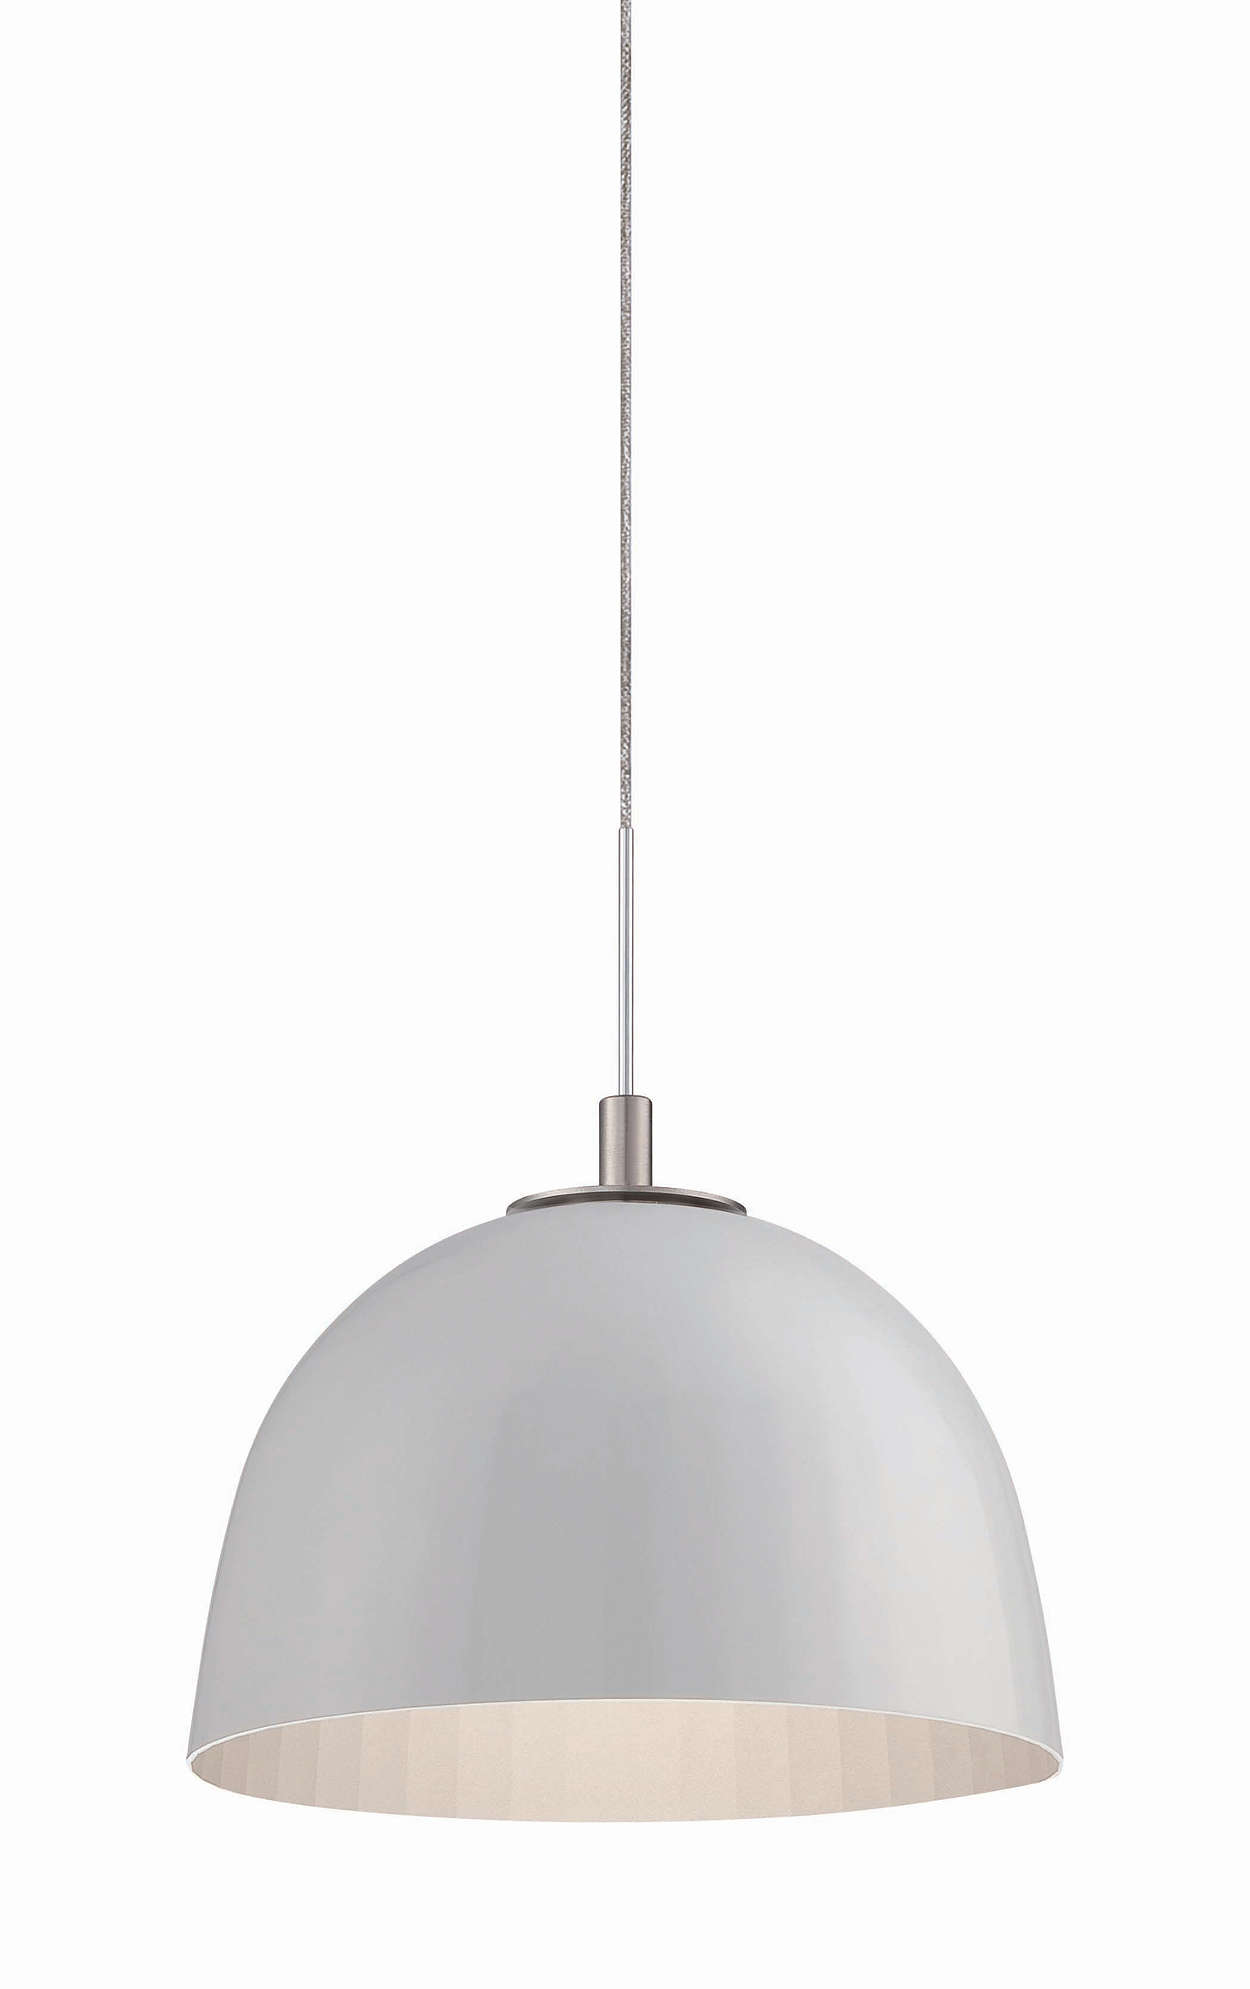 Reflector LED pendant